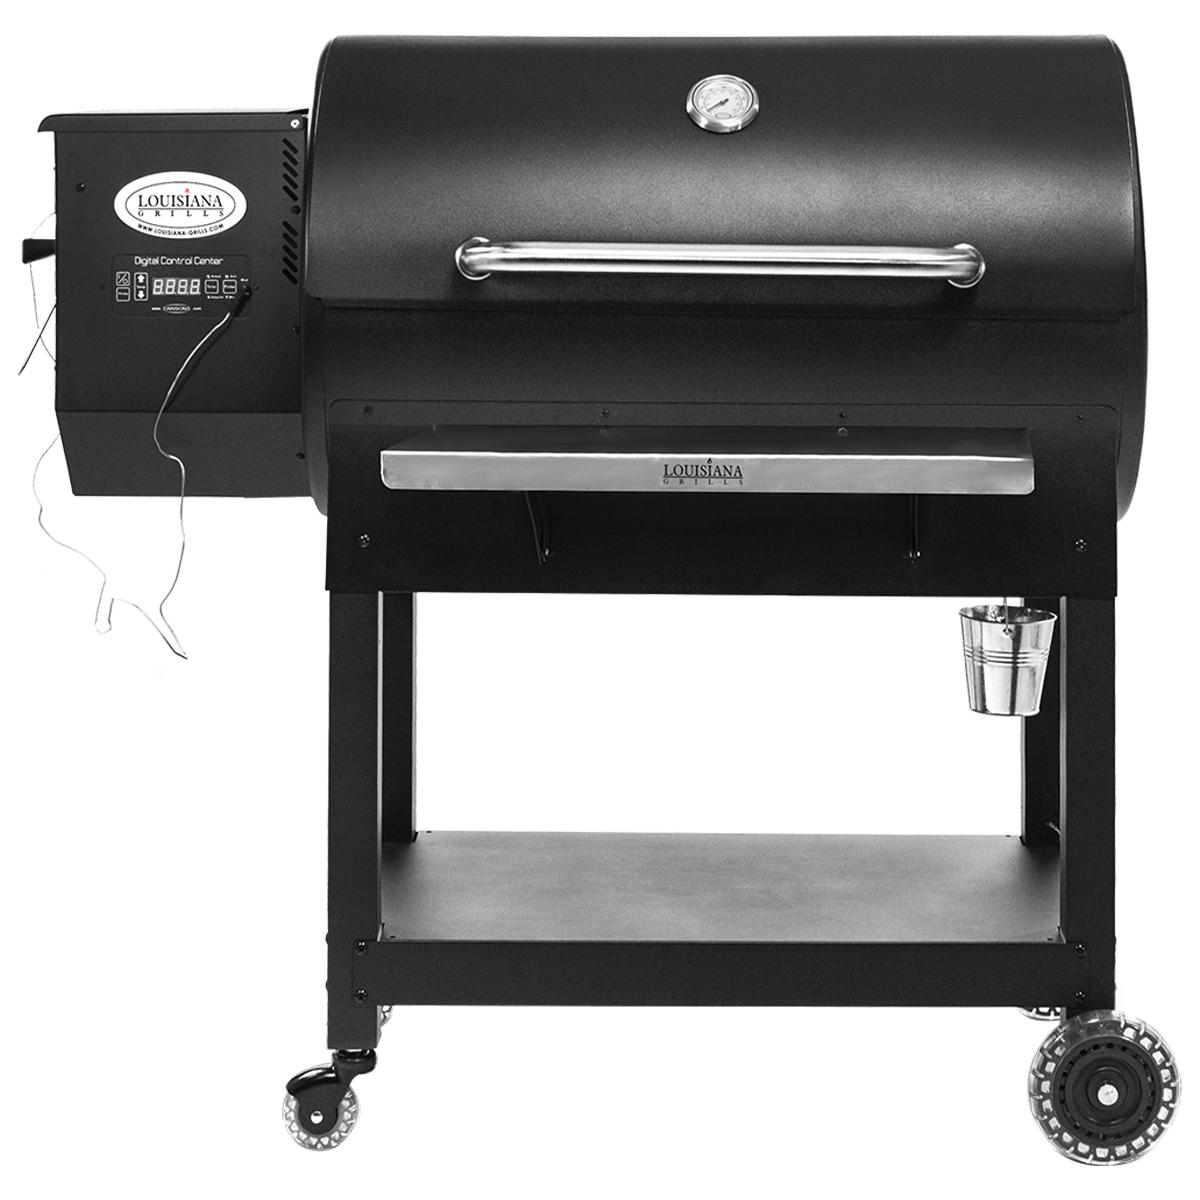 Louisiana Grills Wood Pellet Grill Smoker Costco Australia